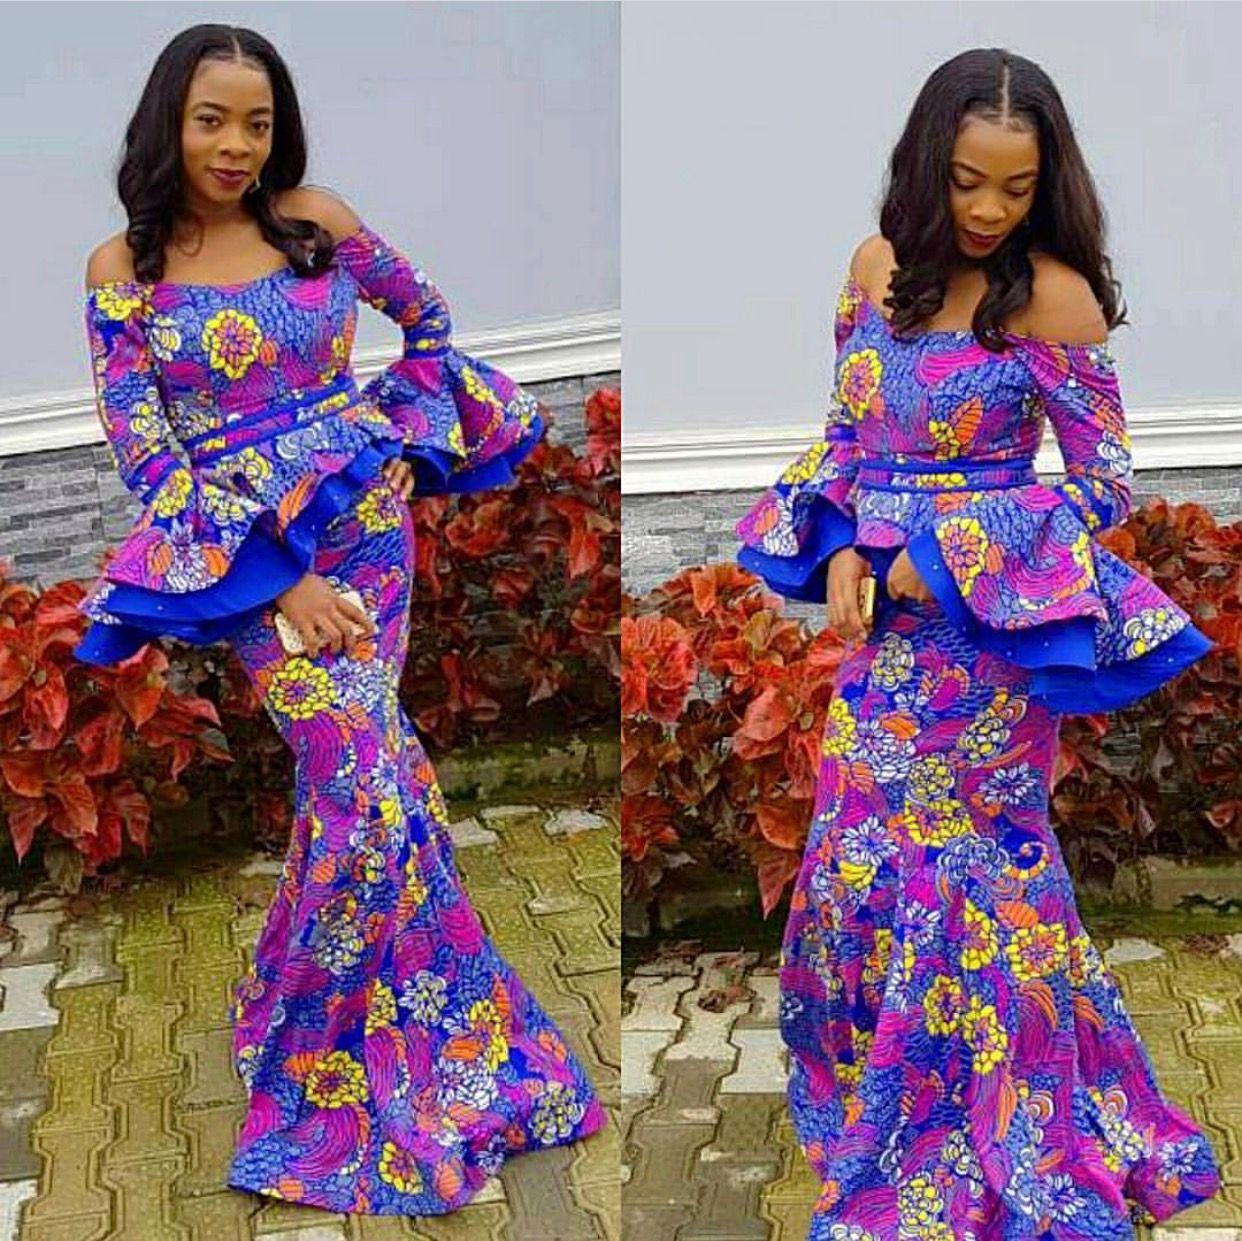 Pin de Bole en robe wax   Pinterest   Ropa africana, Africanos y ...